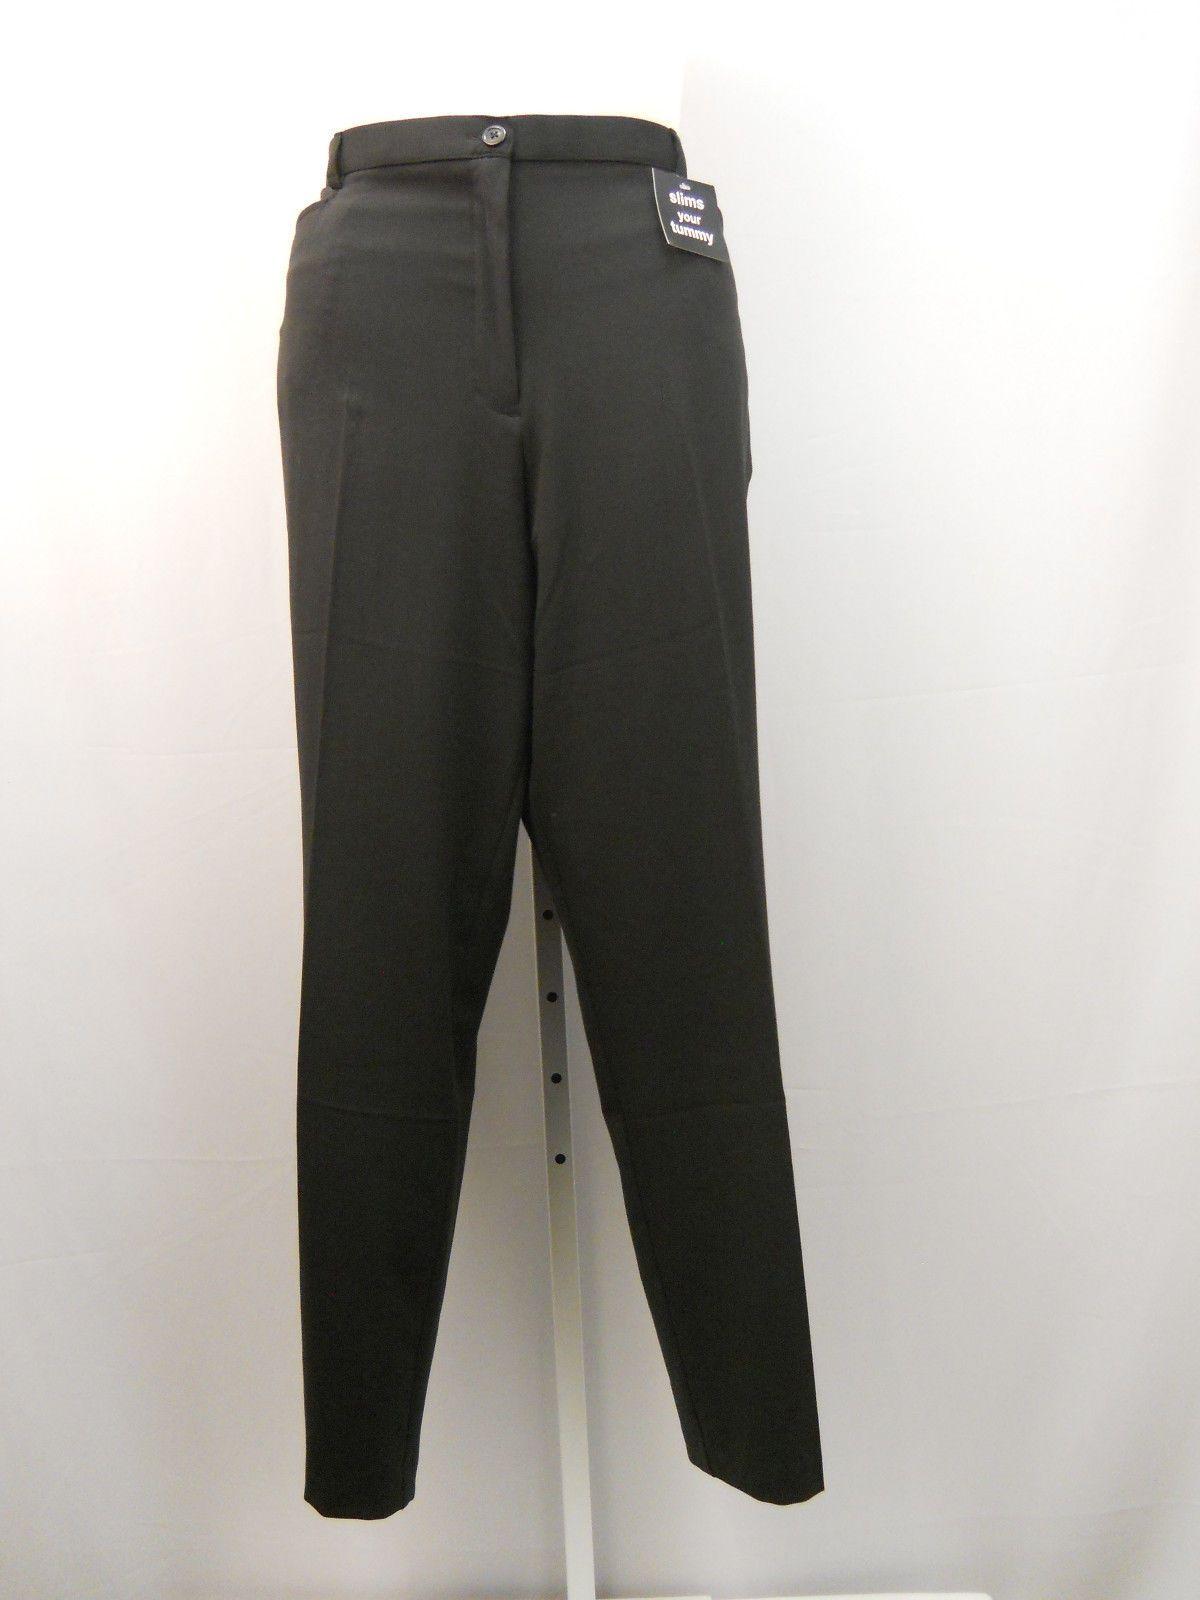 george women�s dress pants plus size 24w solid black tummy